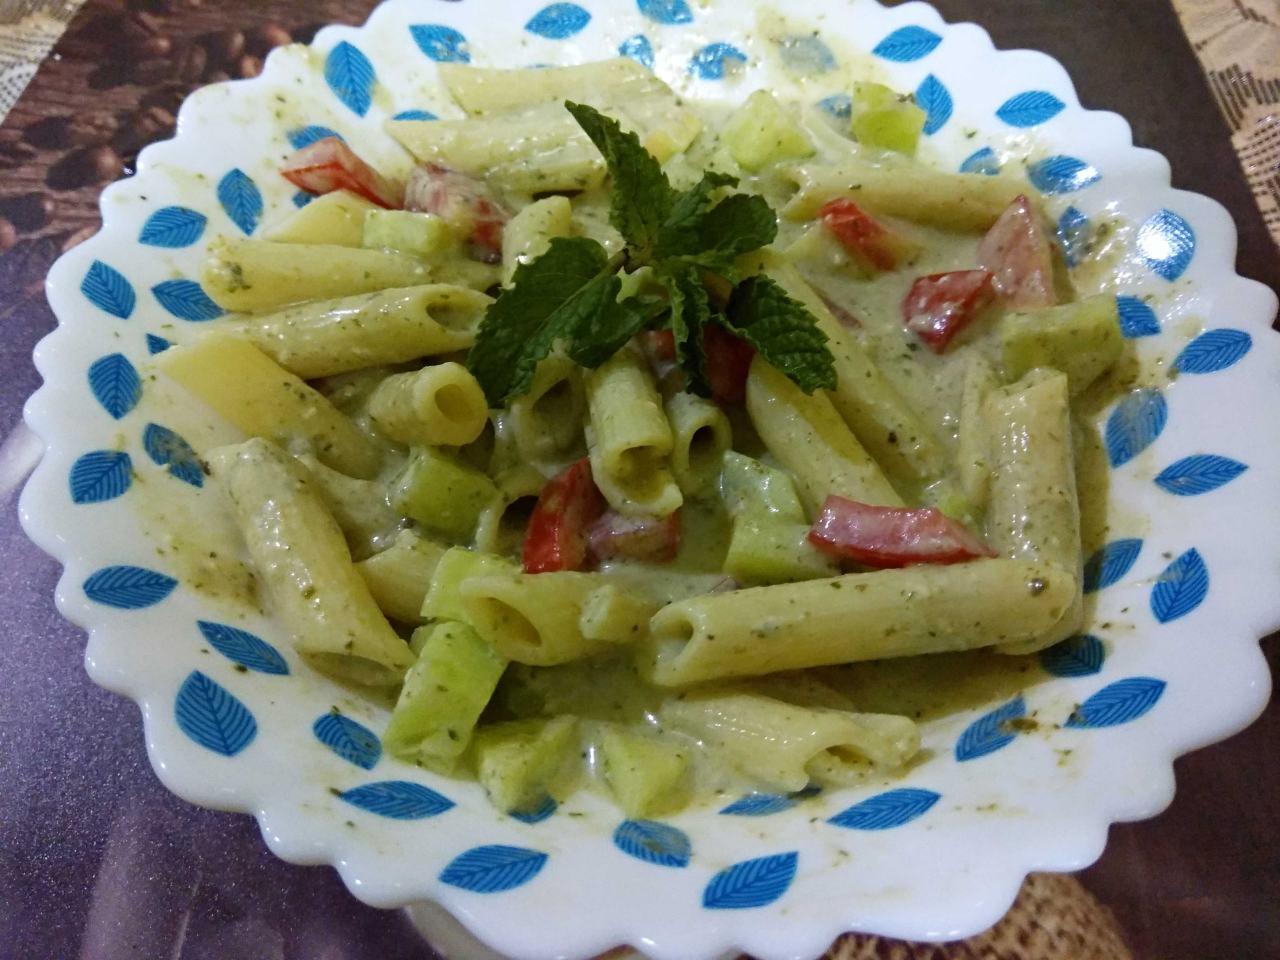 Minty Pasta Salad